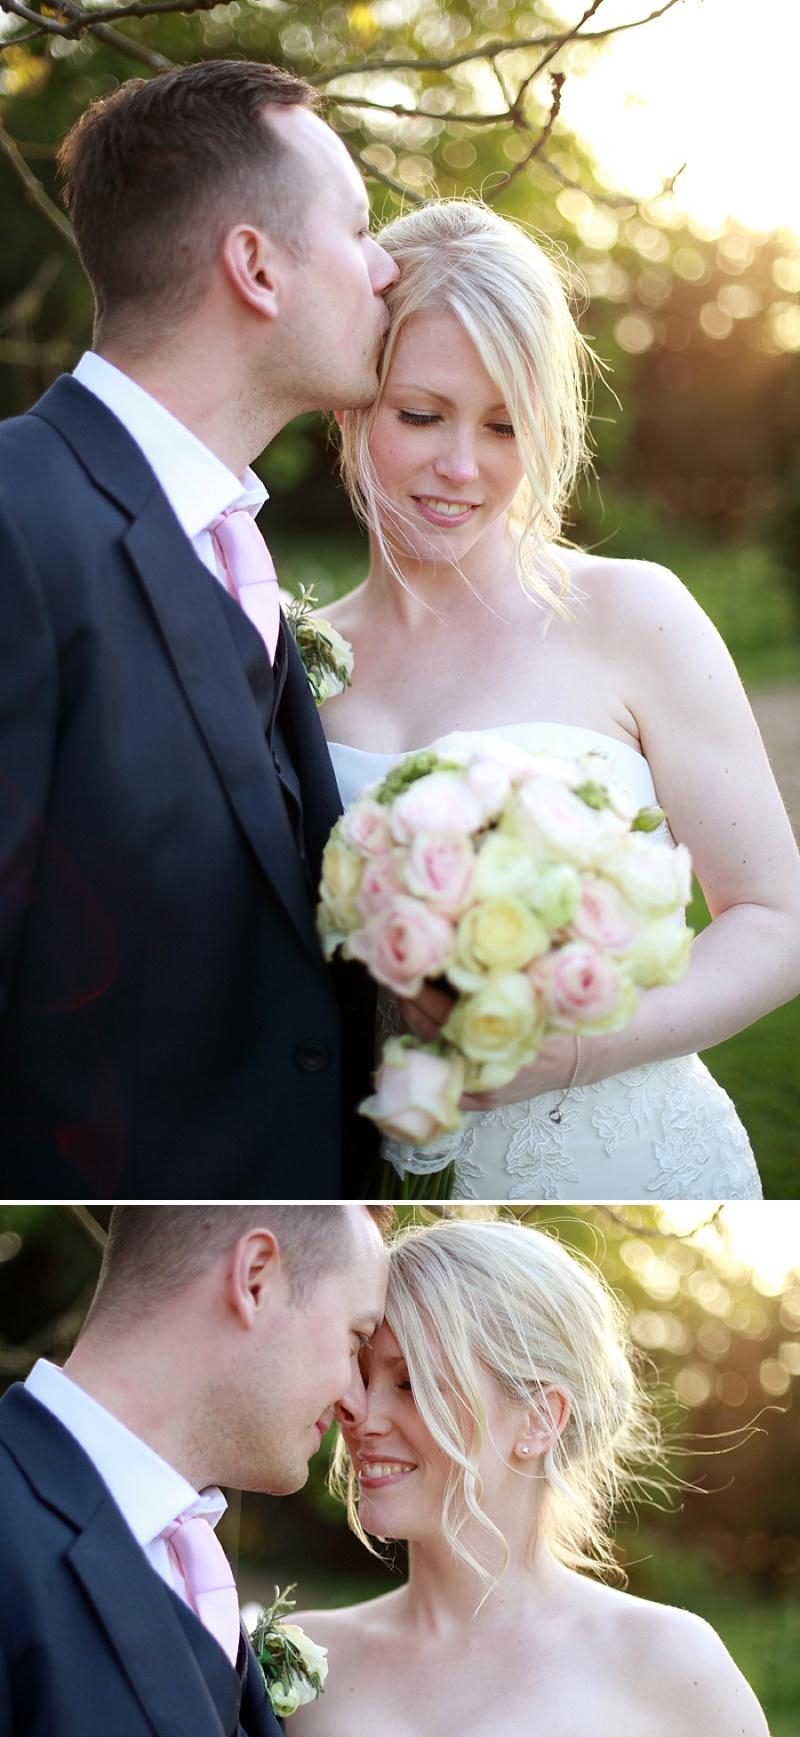 An Outdoor english Wedding At Preston Court In Canterbury With Pronovias Dress_0017